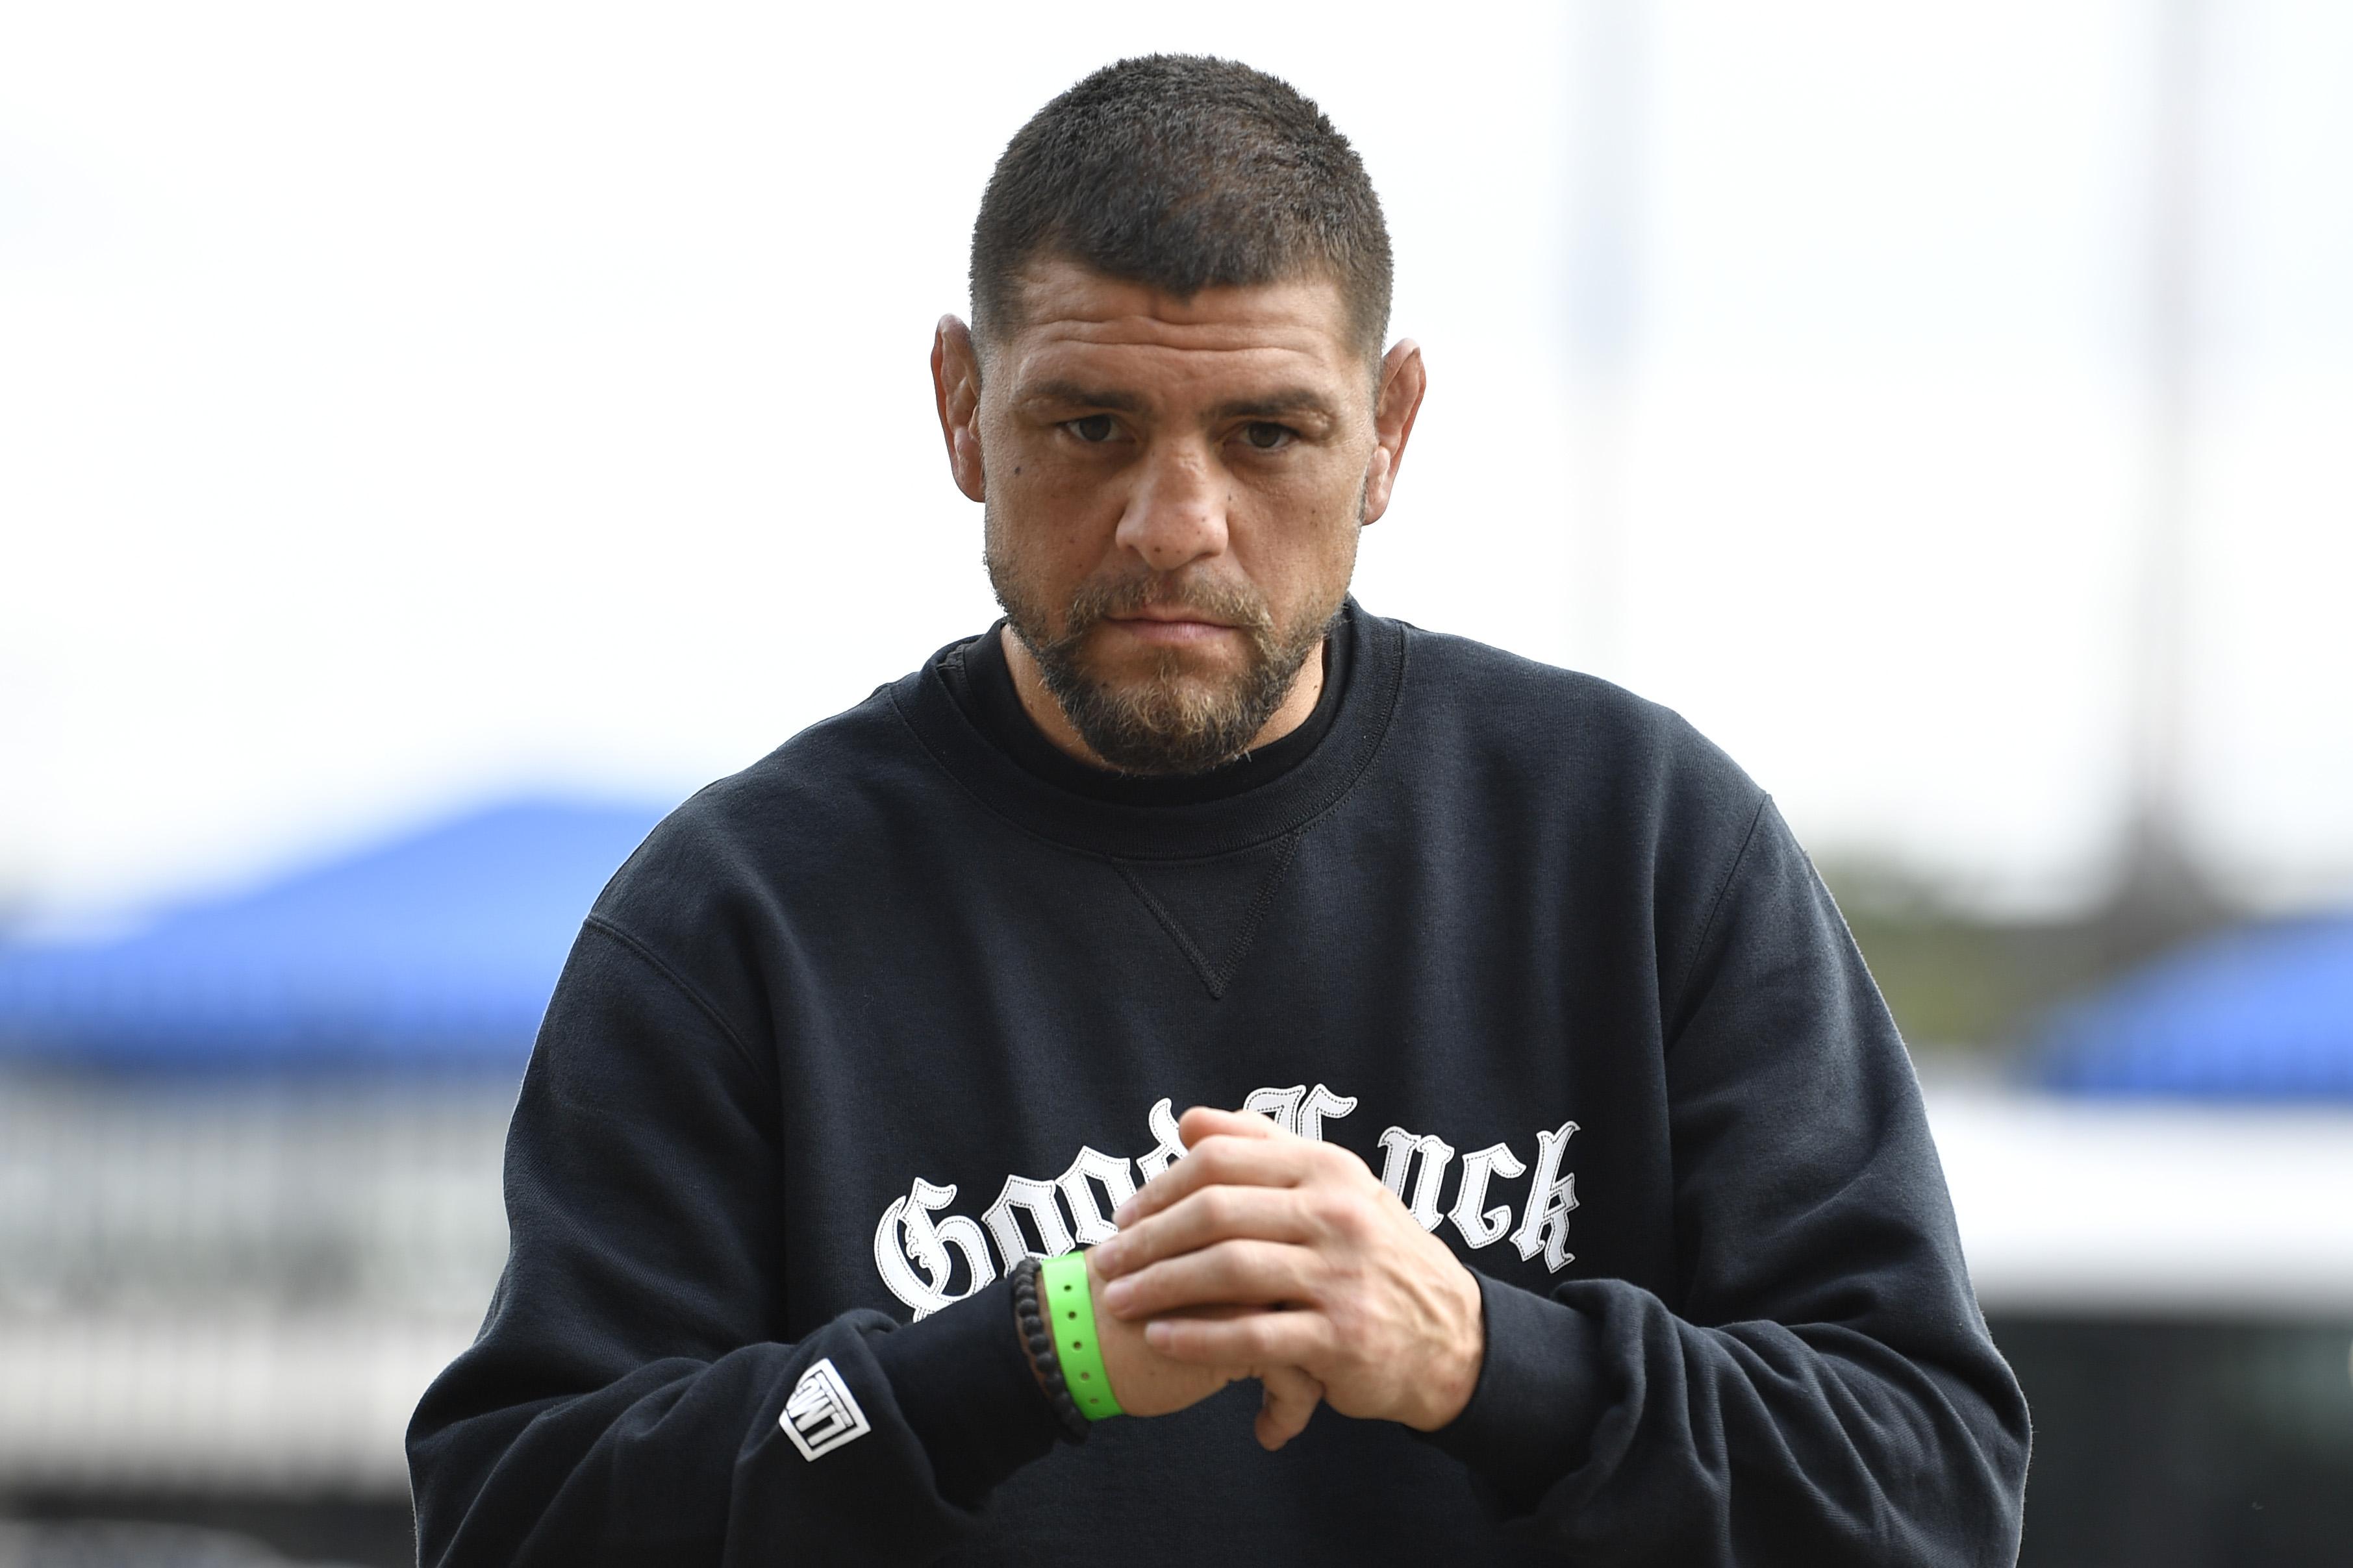 Nick Diaz faces Robbie Lawler at UFC 266